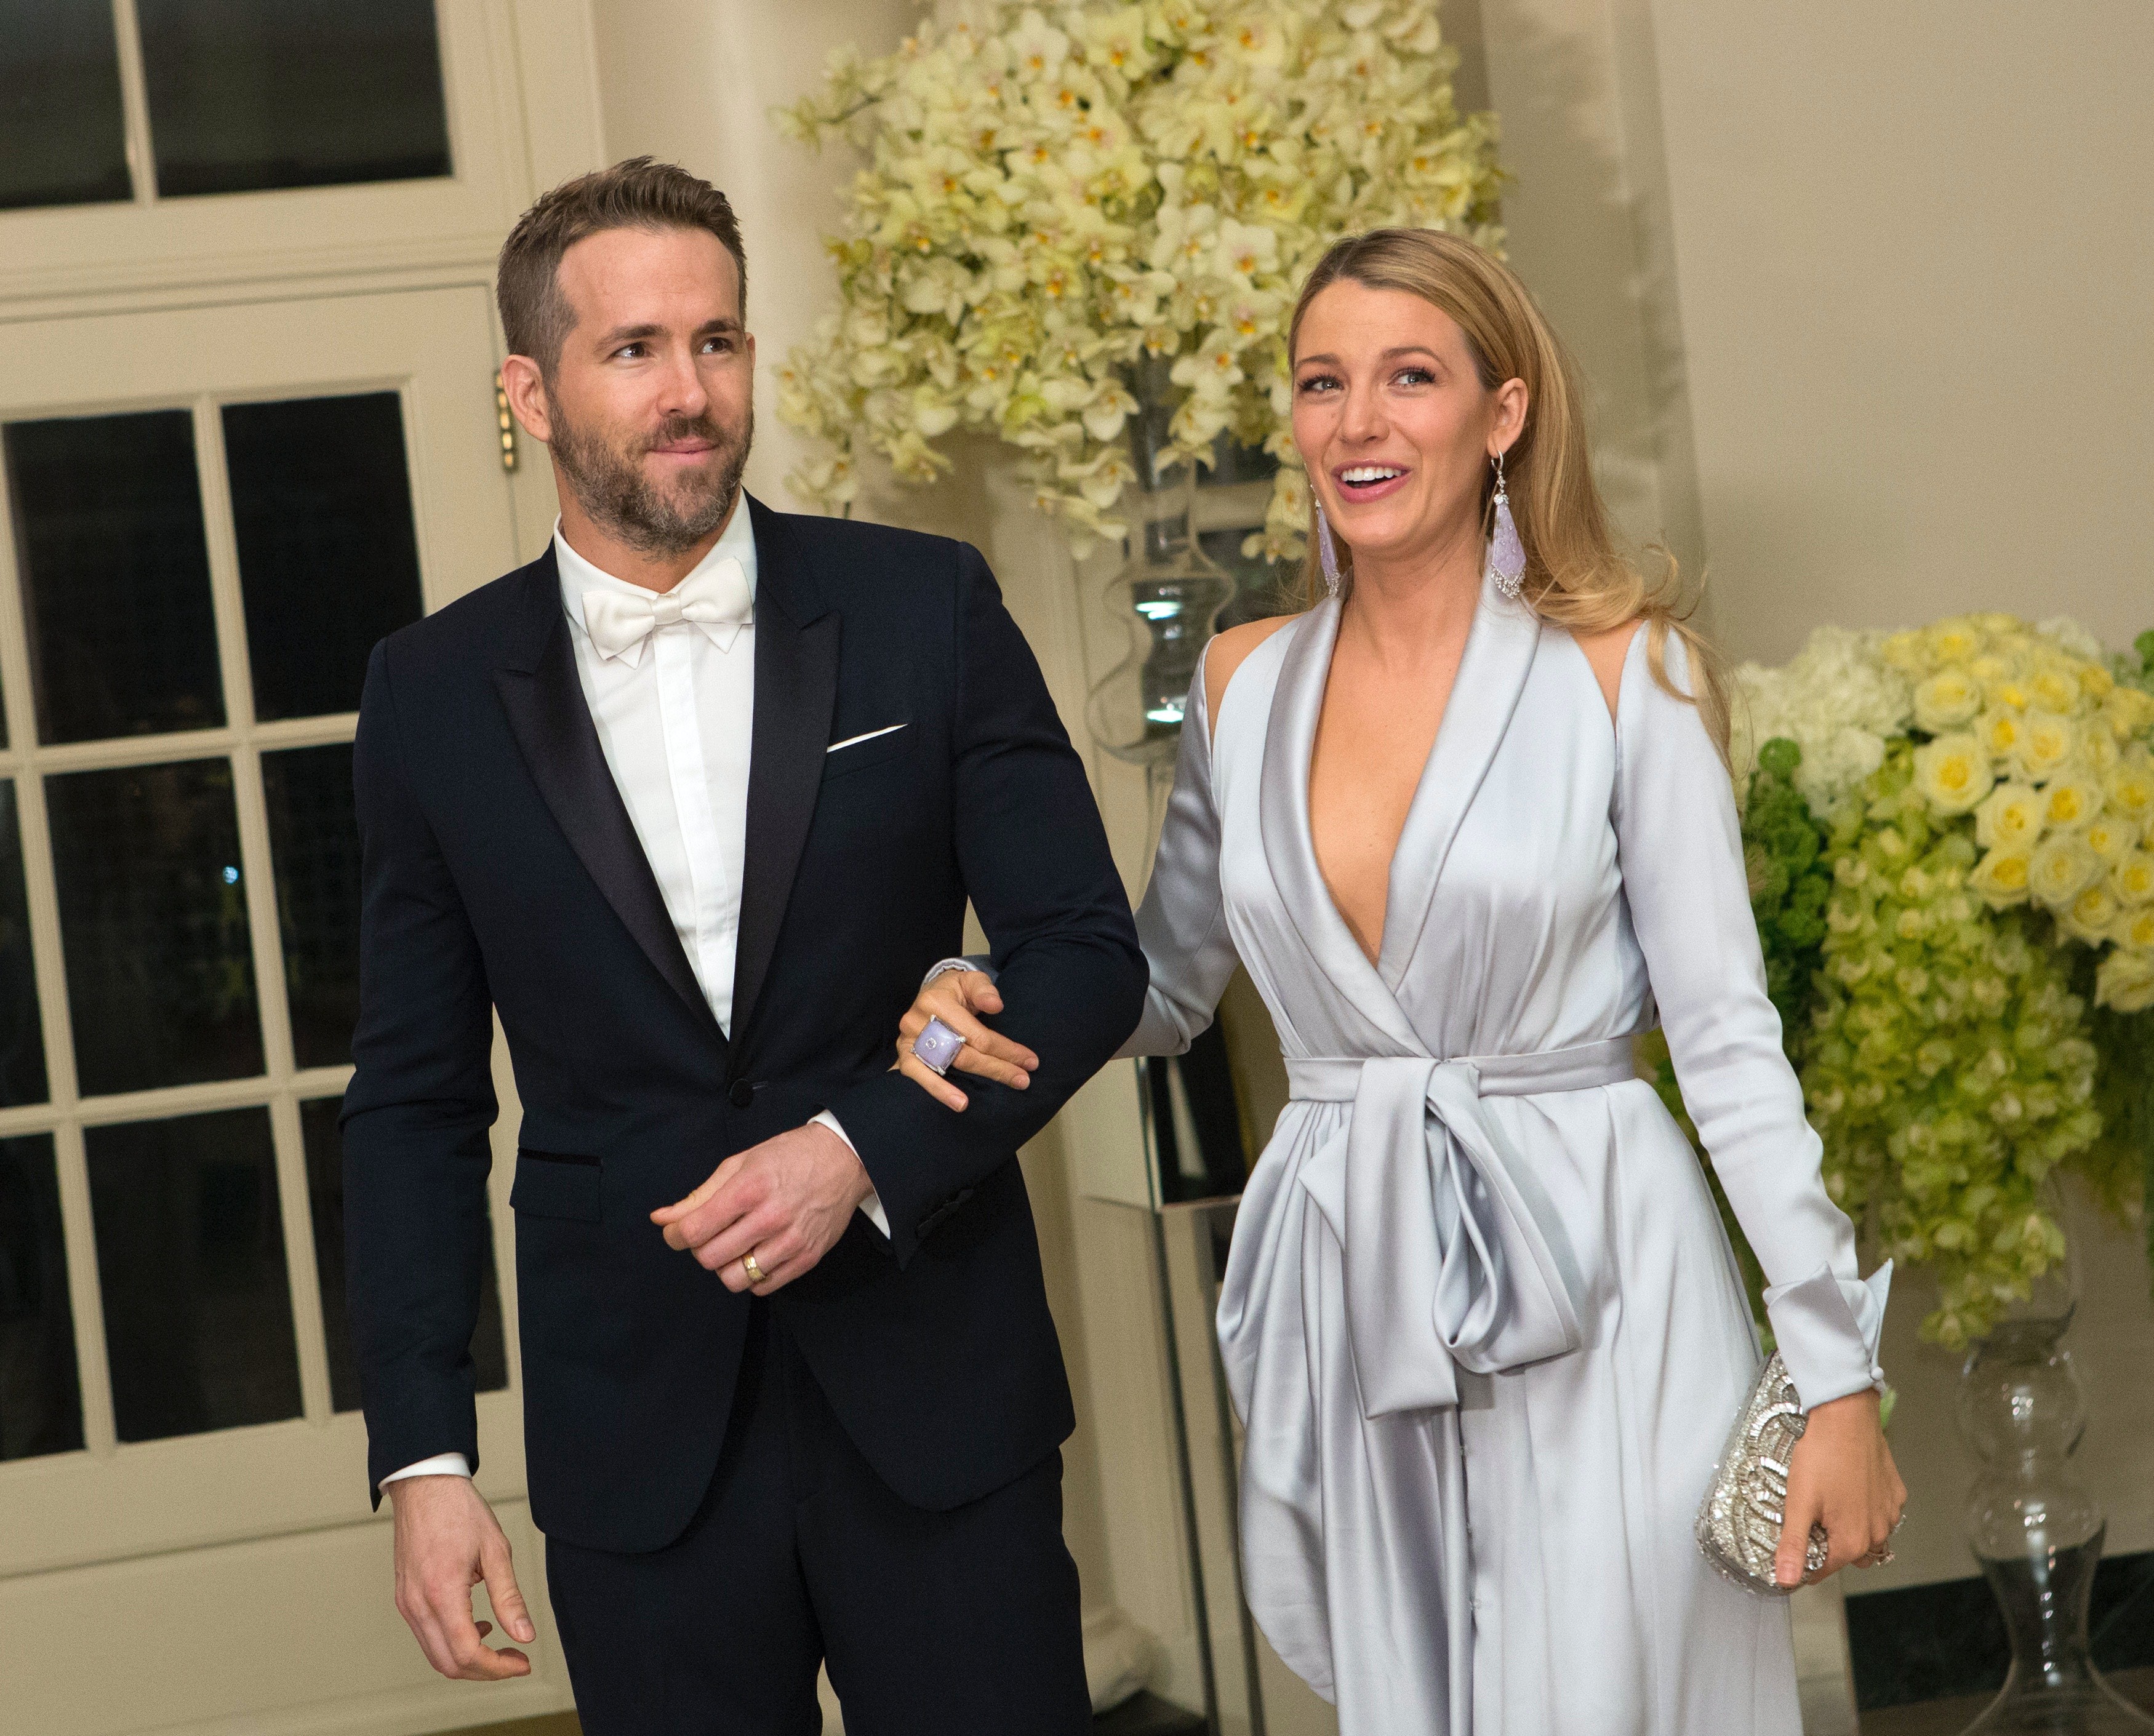 Martha Stewart Daughter Wedding.Photos From Blake Lively Ryan Reynolds Wedding Don T Show